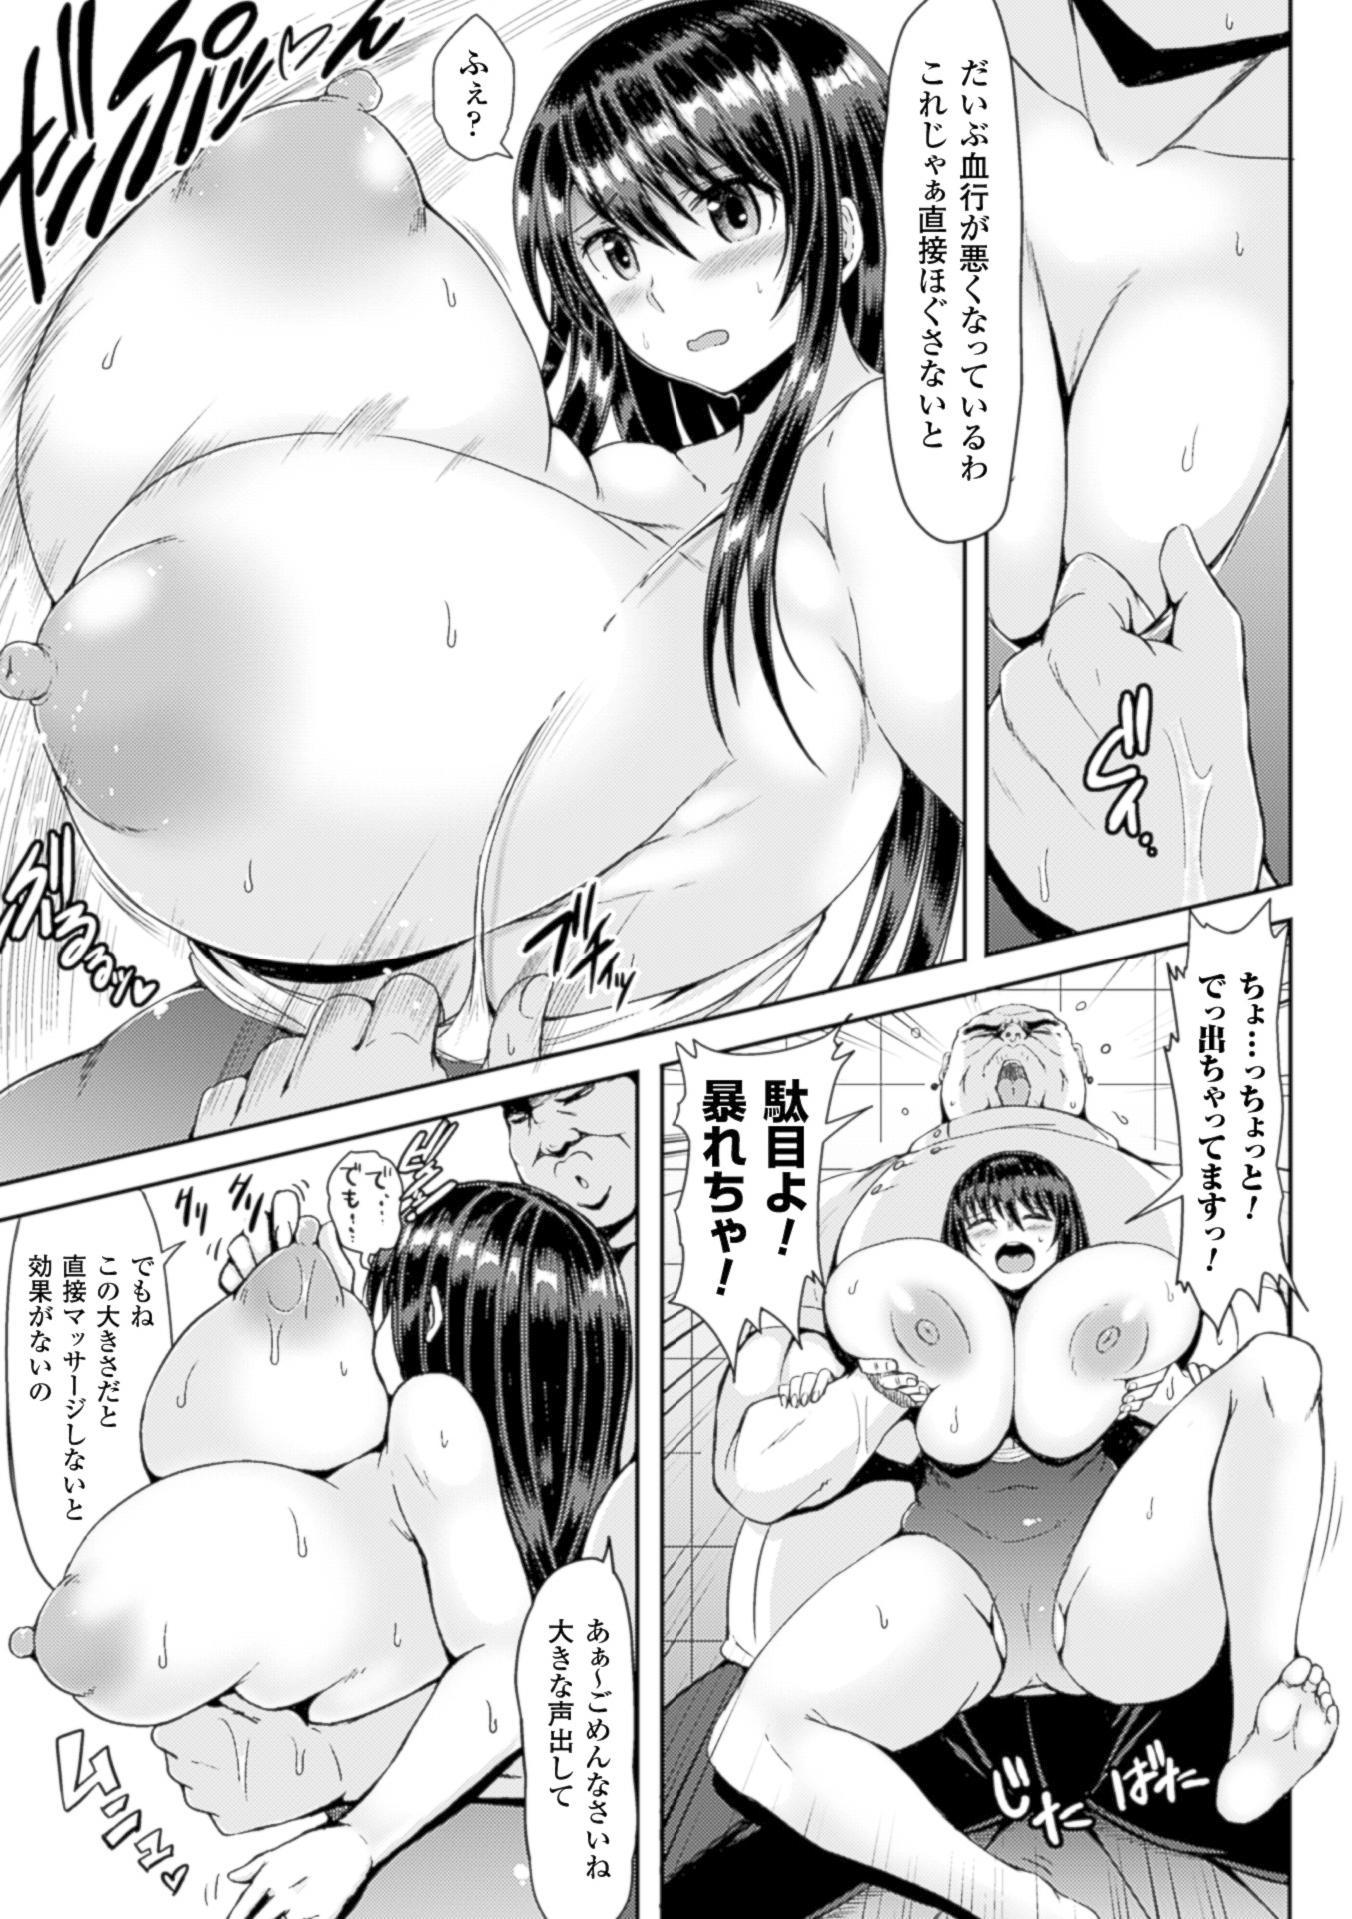 2D Comic Magazine Seikan Massage de Kyousei Etsuraku Detox! Vol. 2 28